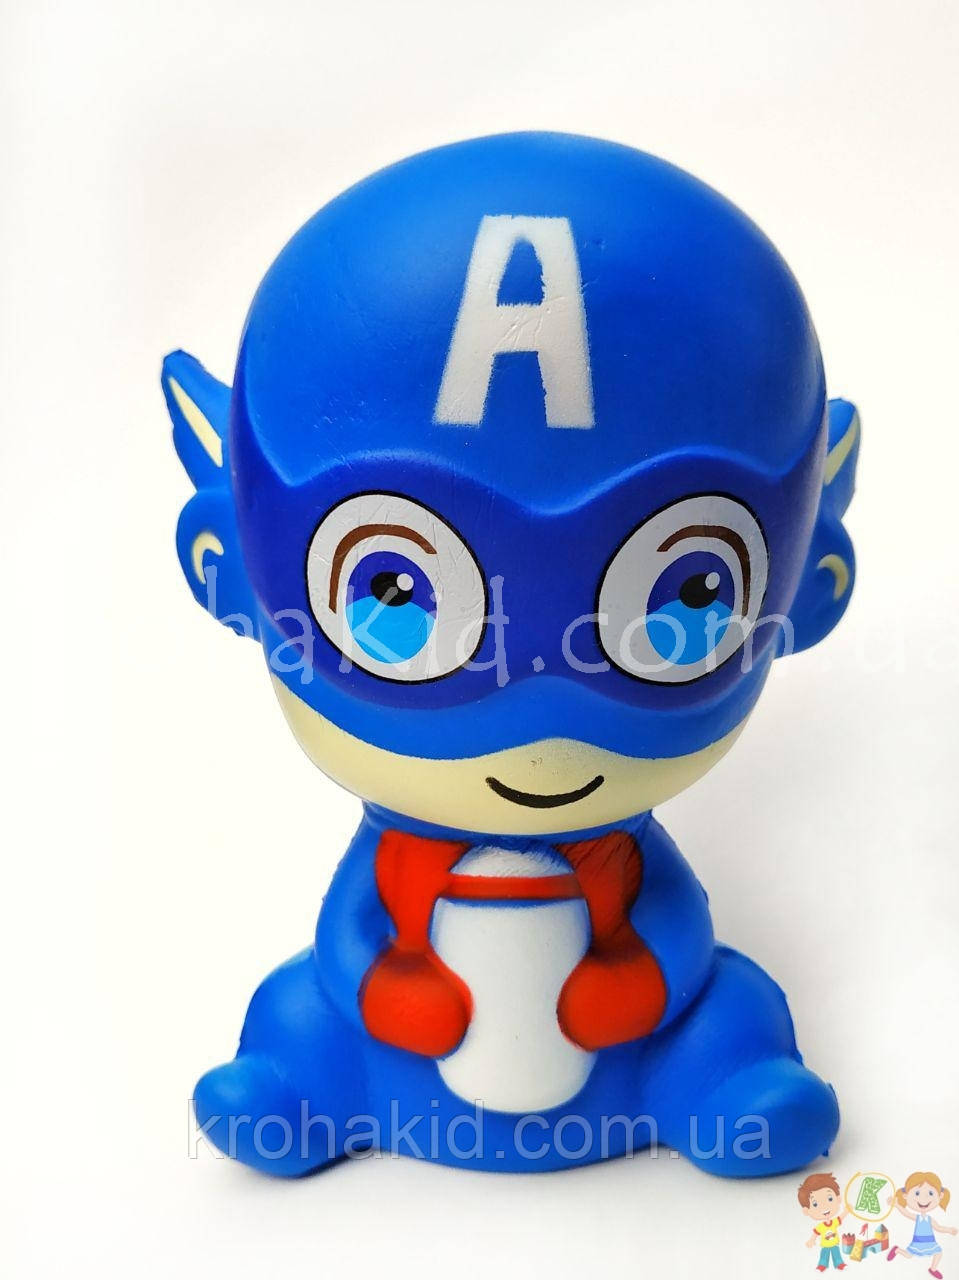 Сквиш супергерой Марвел / superhero Squishy / Сквуши/ Игрушка-антистересс